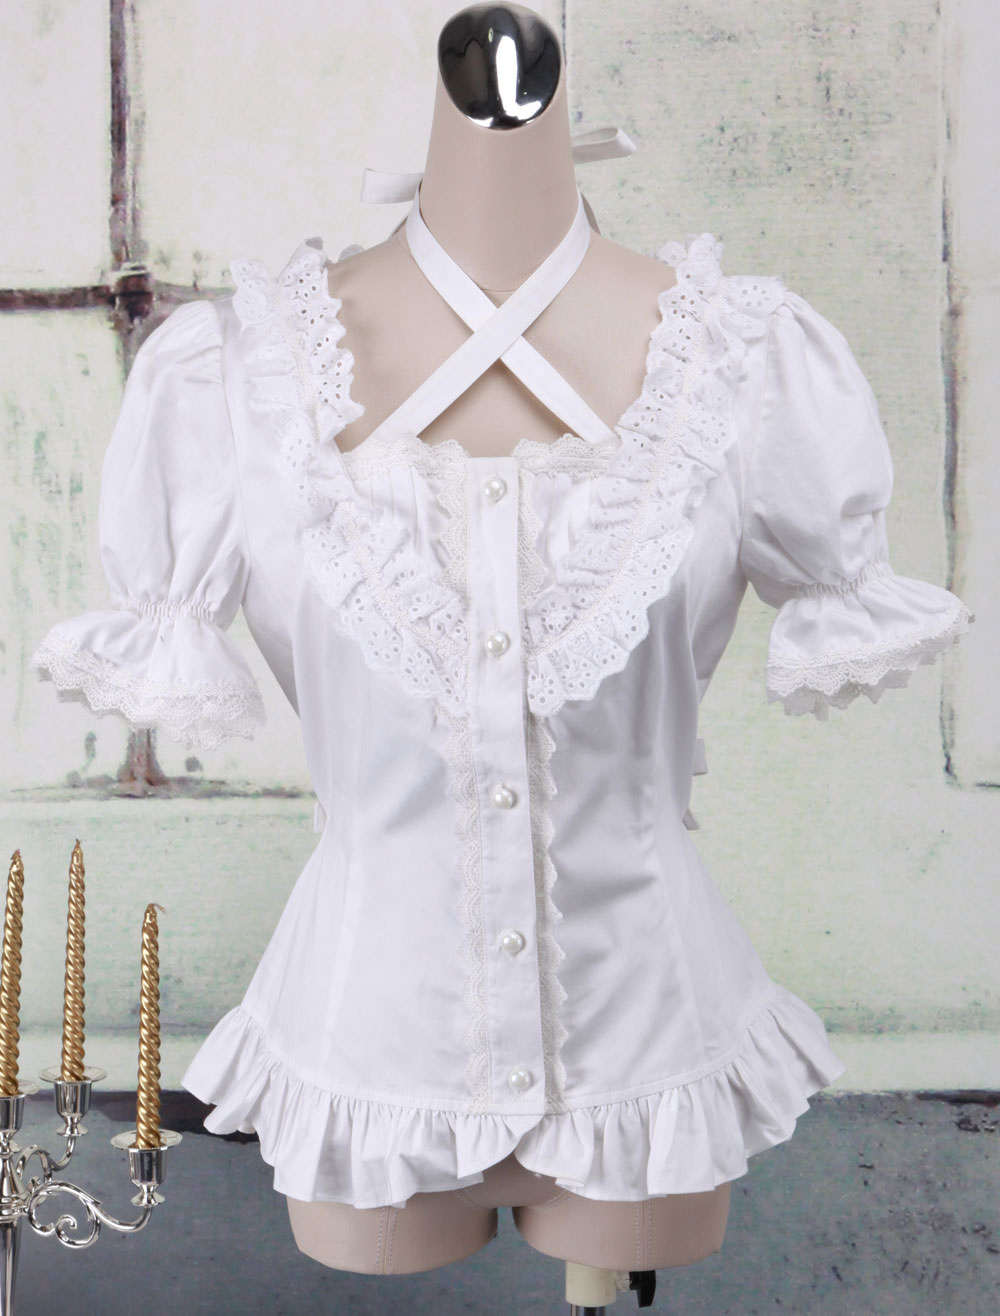 White Cotton Lolita Blouse Short Sleeves Neck Straps Lace Trim Ruffles